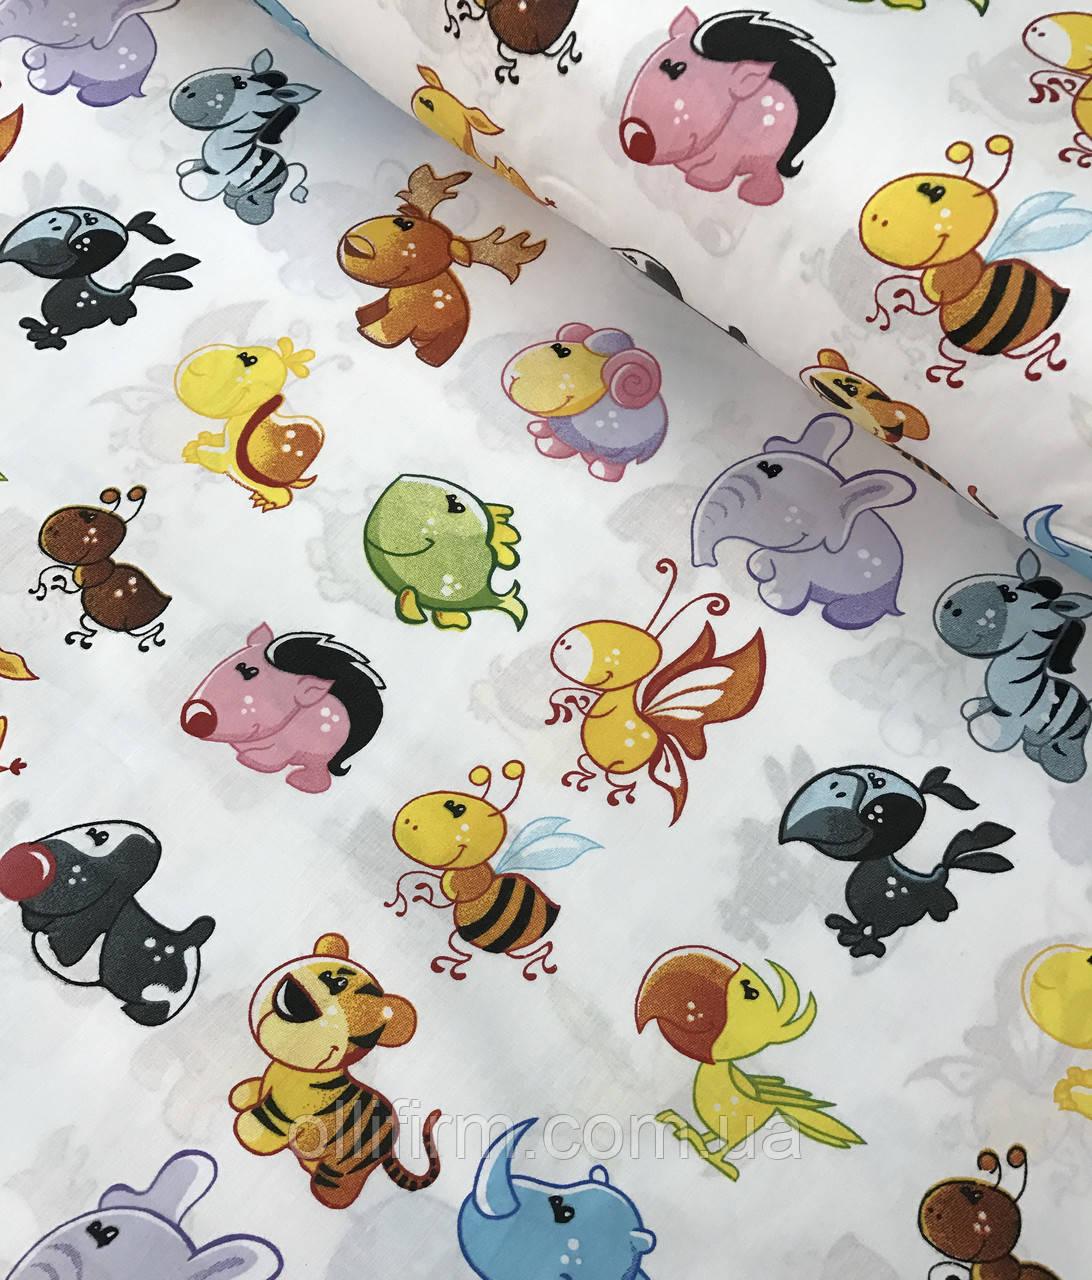 Хлопковая ткань польская зверята разноцветные